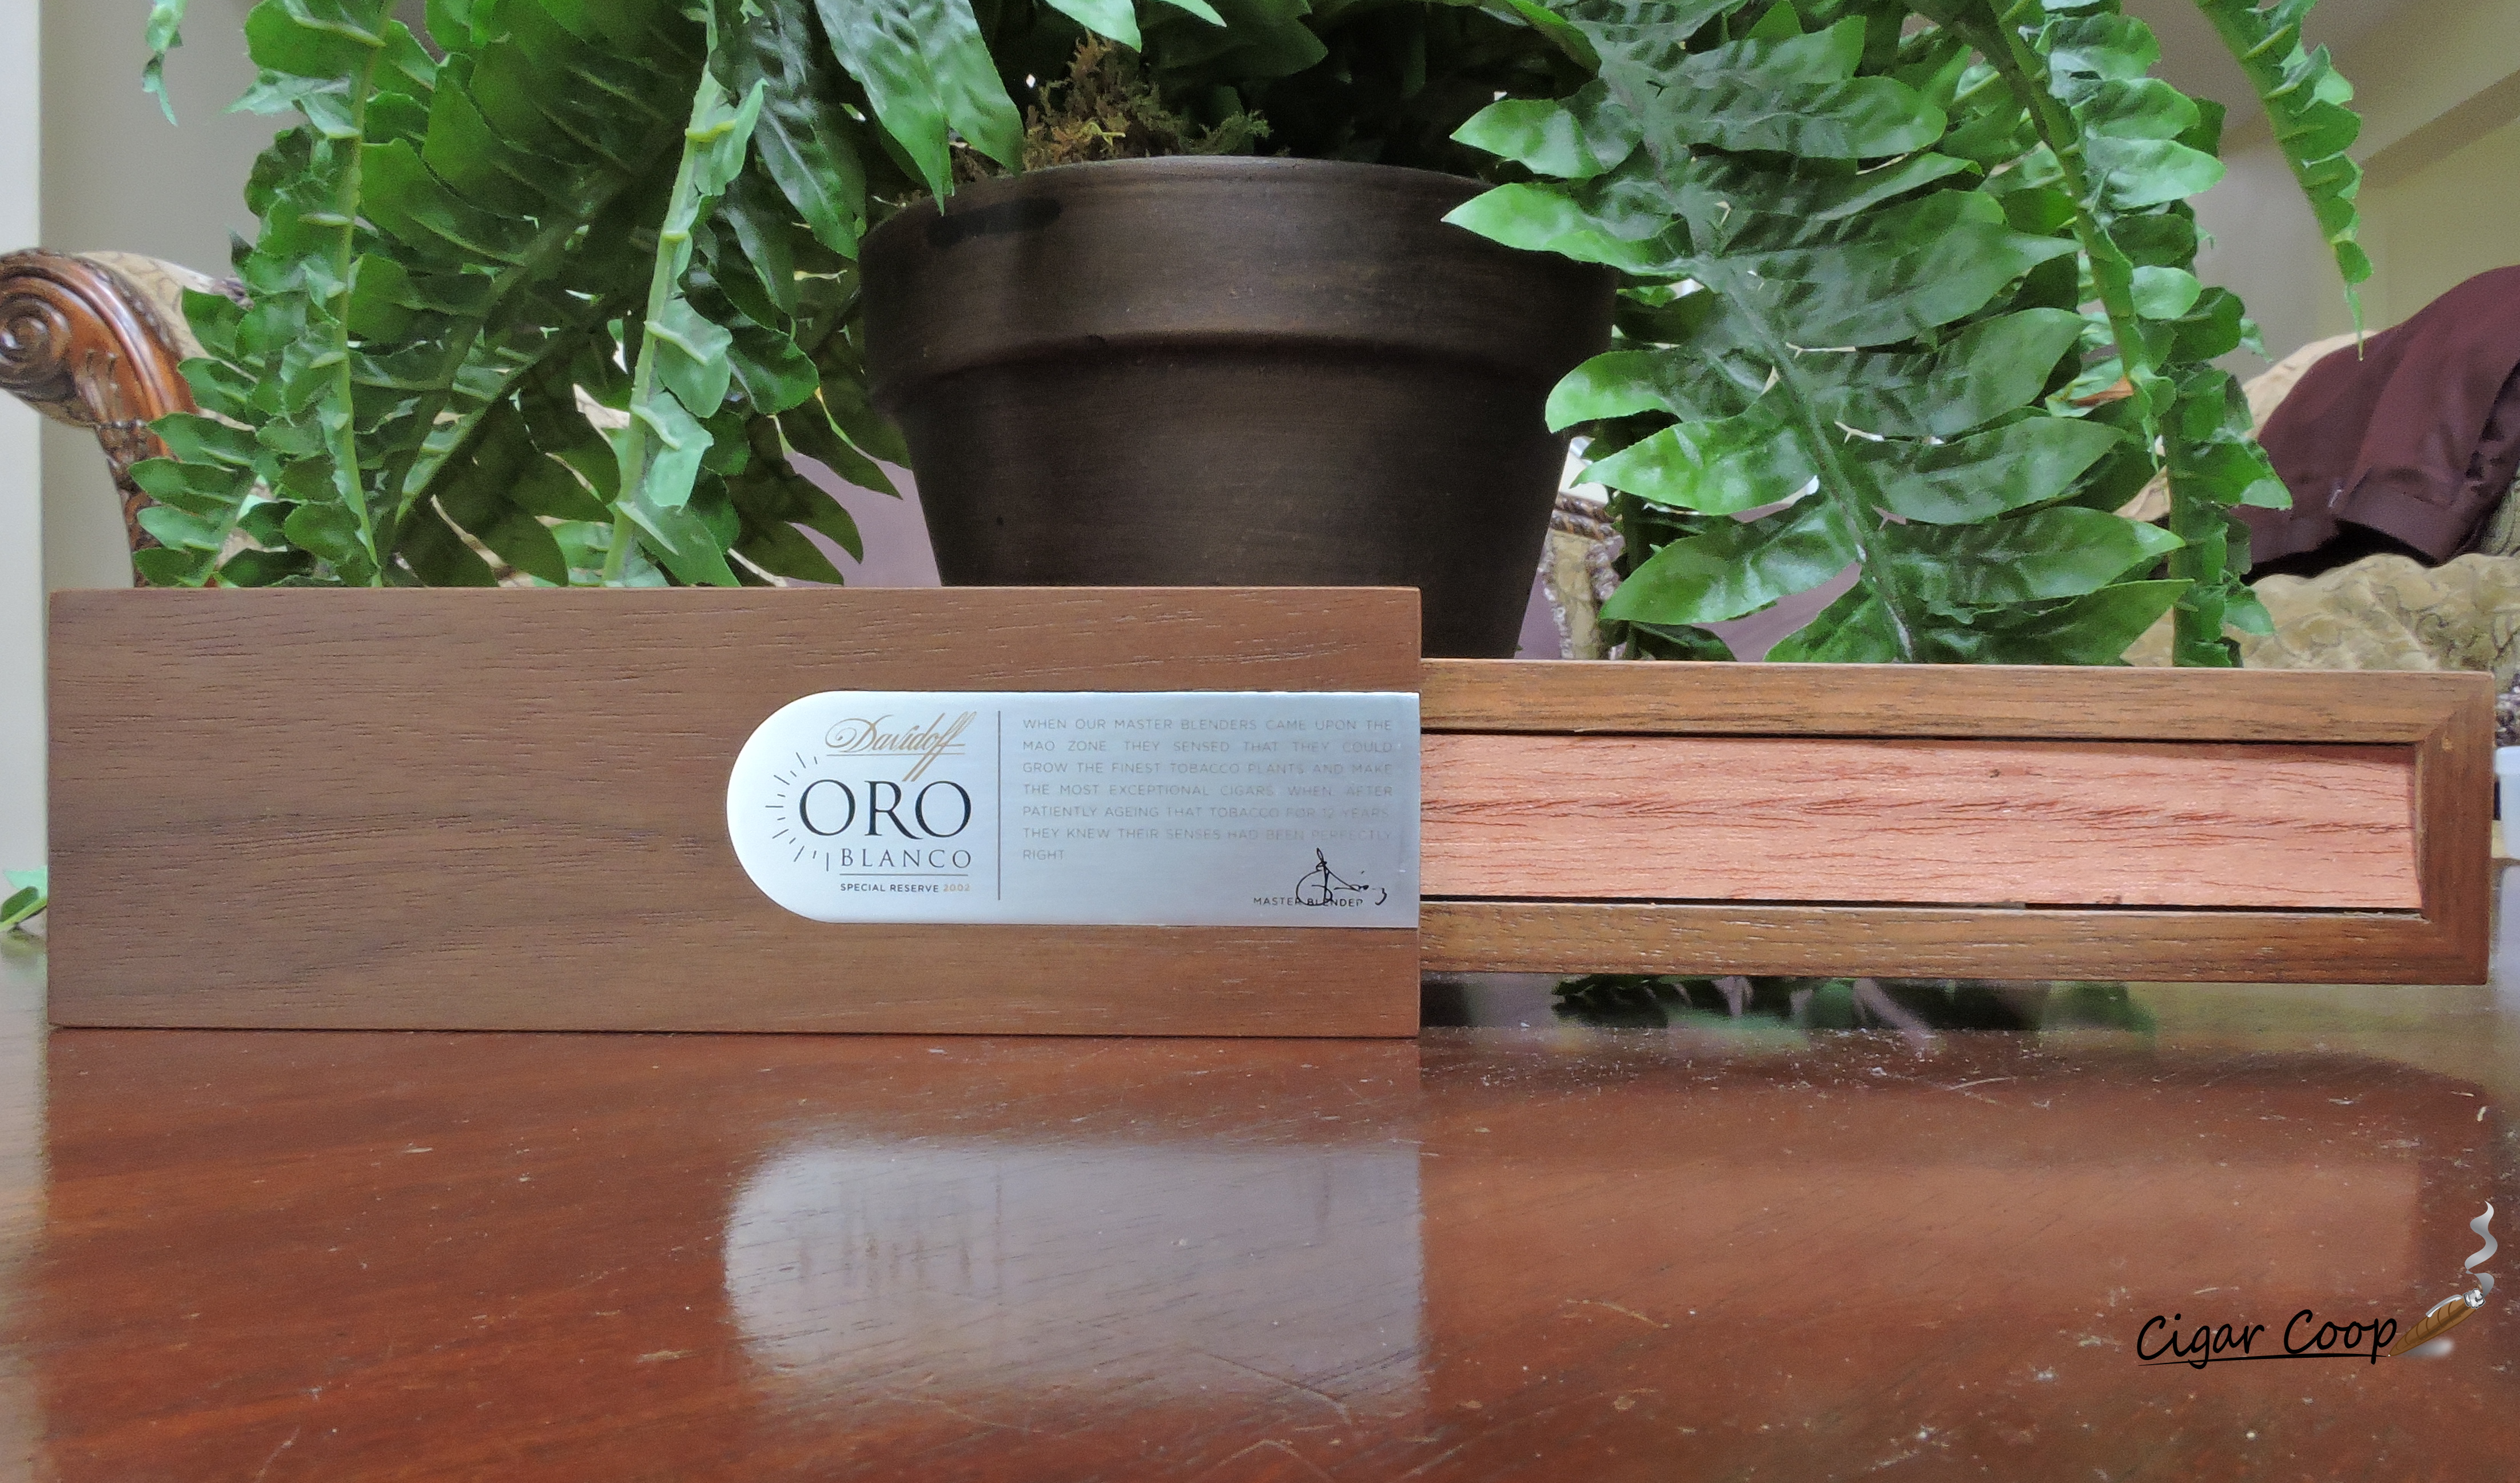 Davidoff Oro Blanco Individual Box